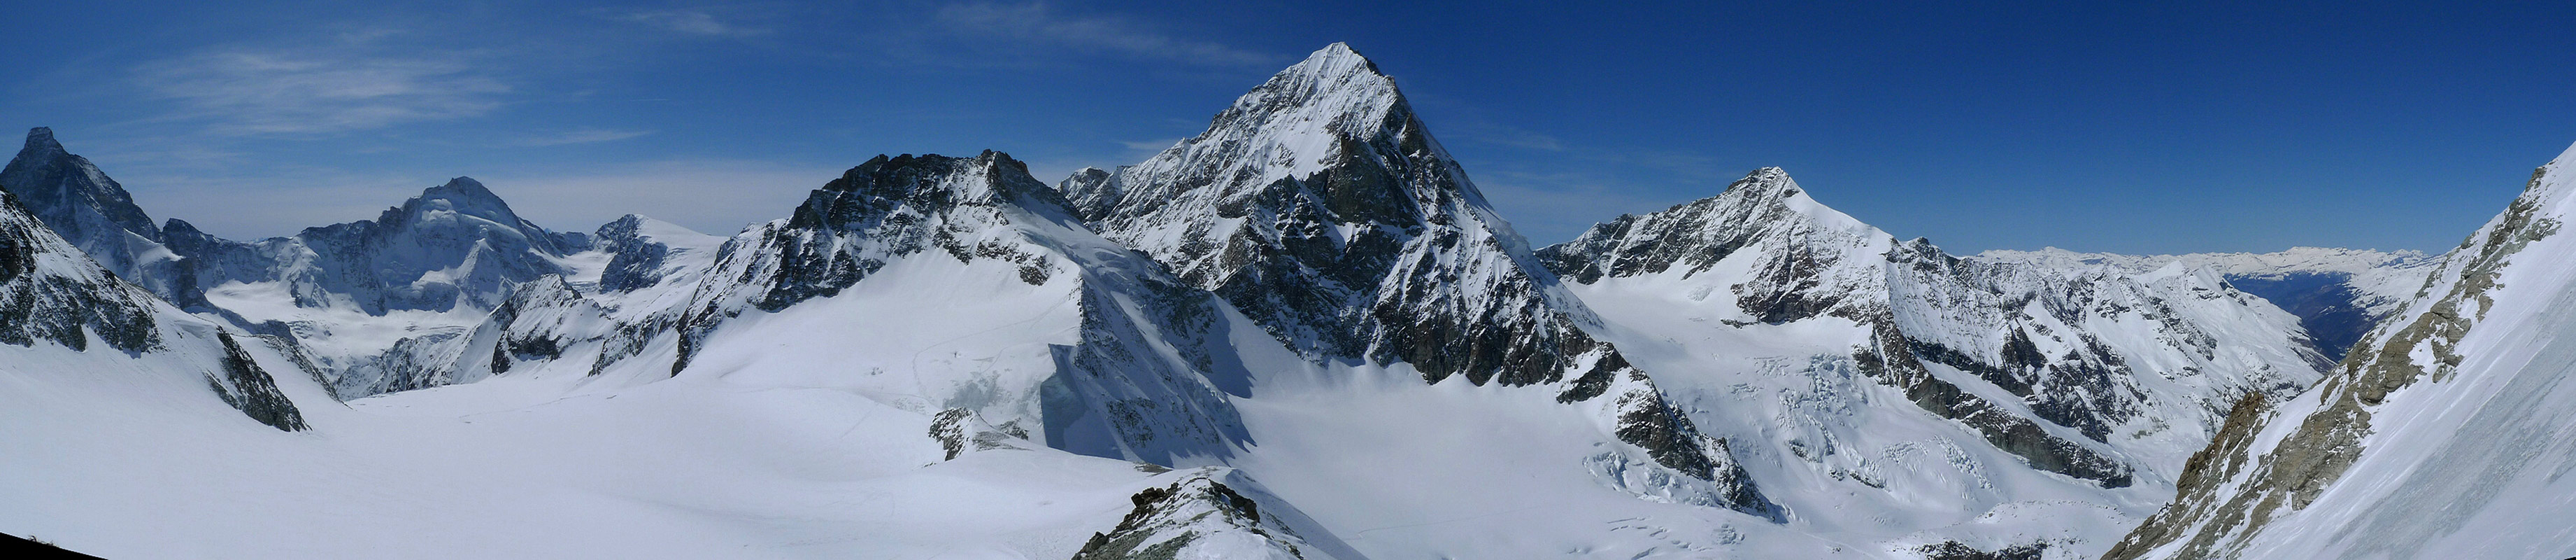 Mont Durand / Arbenhorn Walliser Alpen / Alpes valaisannes Switzerland panorama 48